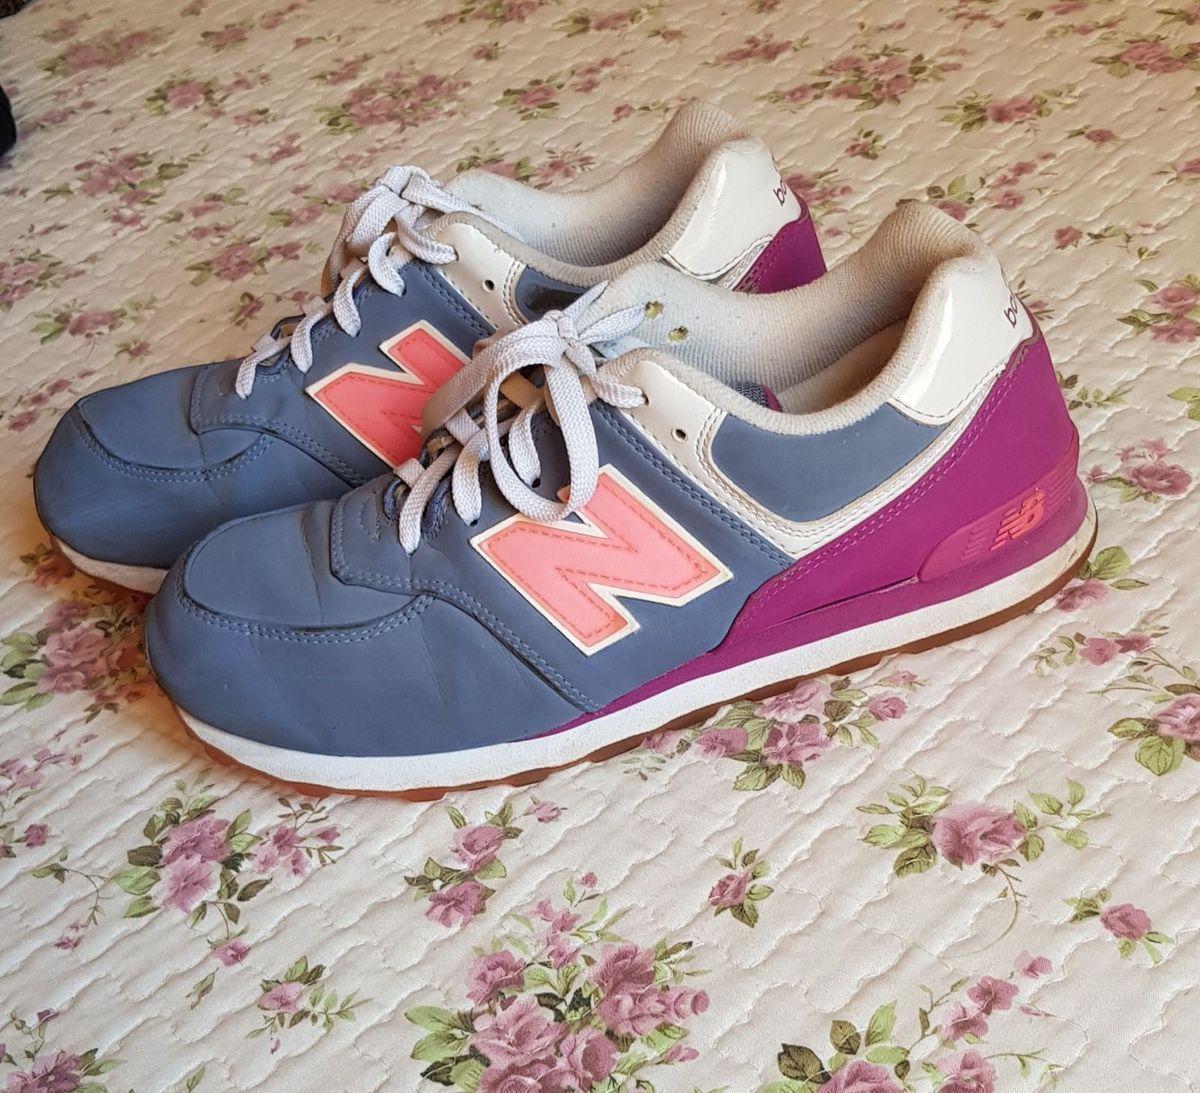 8c1b64aa529 new balance 574 azul e rosa - tênis new balance.  Czm6ly9wag90b3muzw5qb2vplmnvbs5ici9wcm9kdwn0cy82otk2ntq1l2viyjg4otjmytzknjq2nwvjzjrhzdnjzgy3n2yzytg0lmpwzw  ...